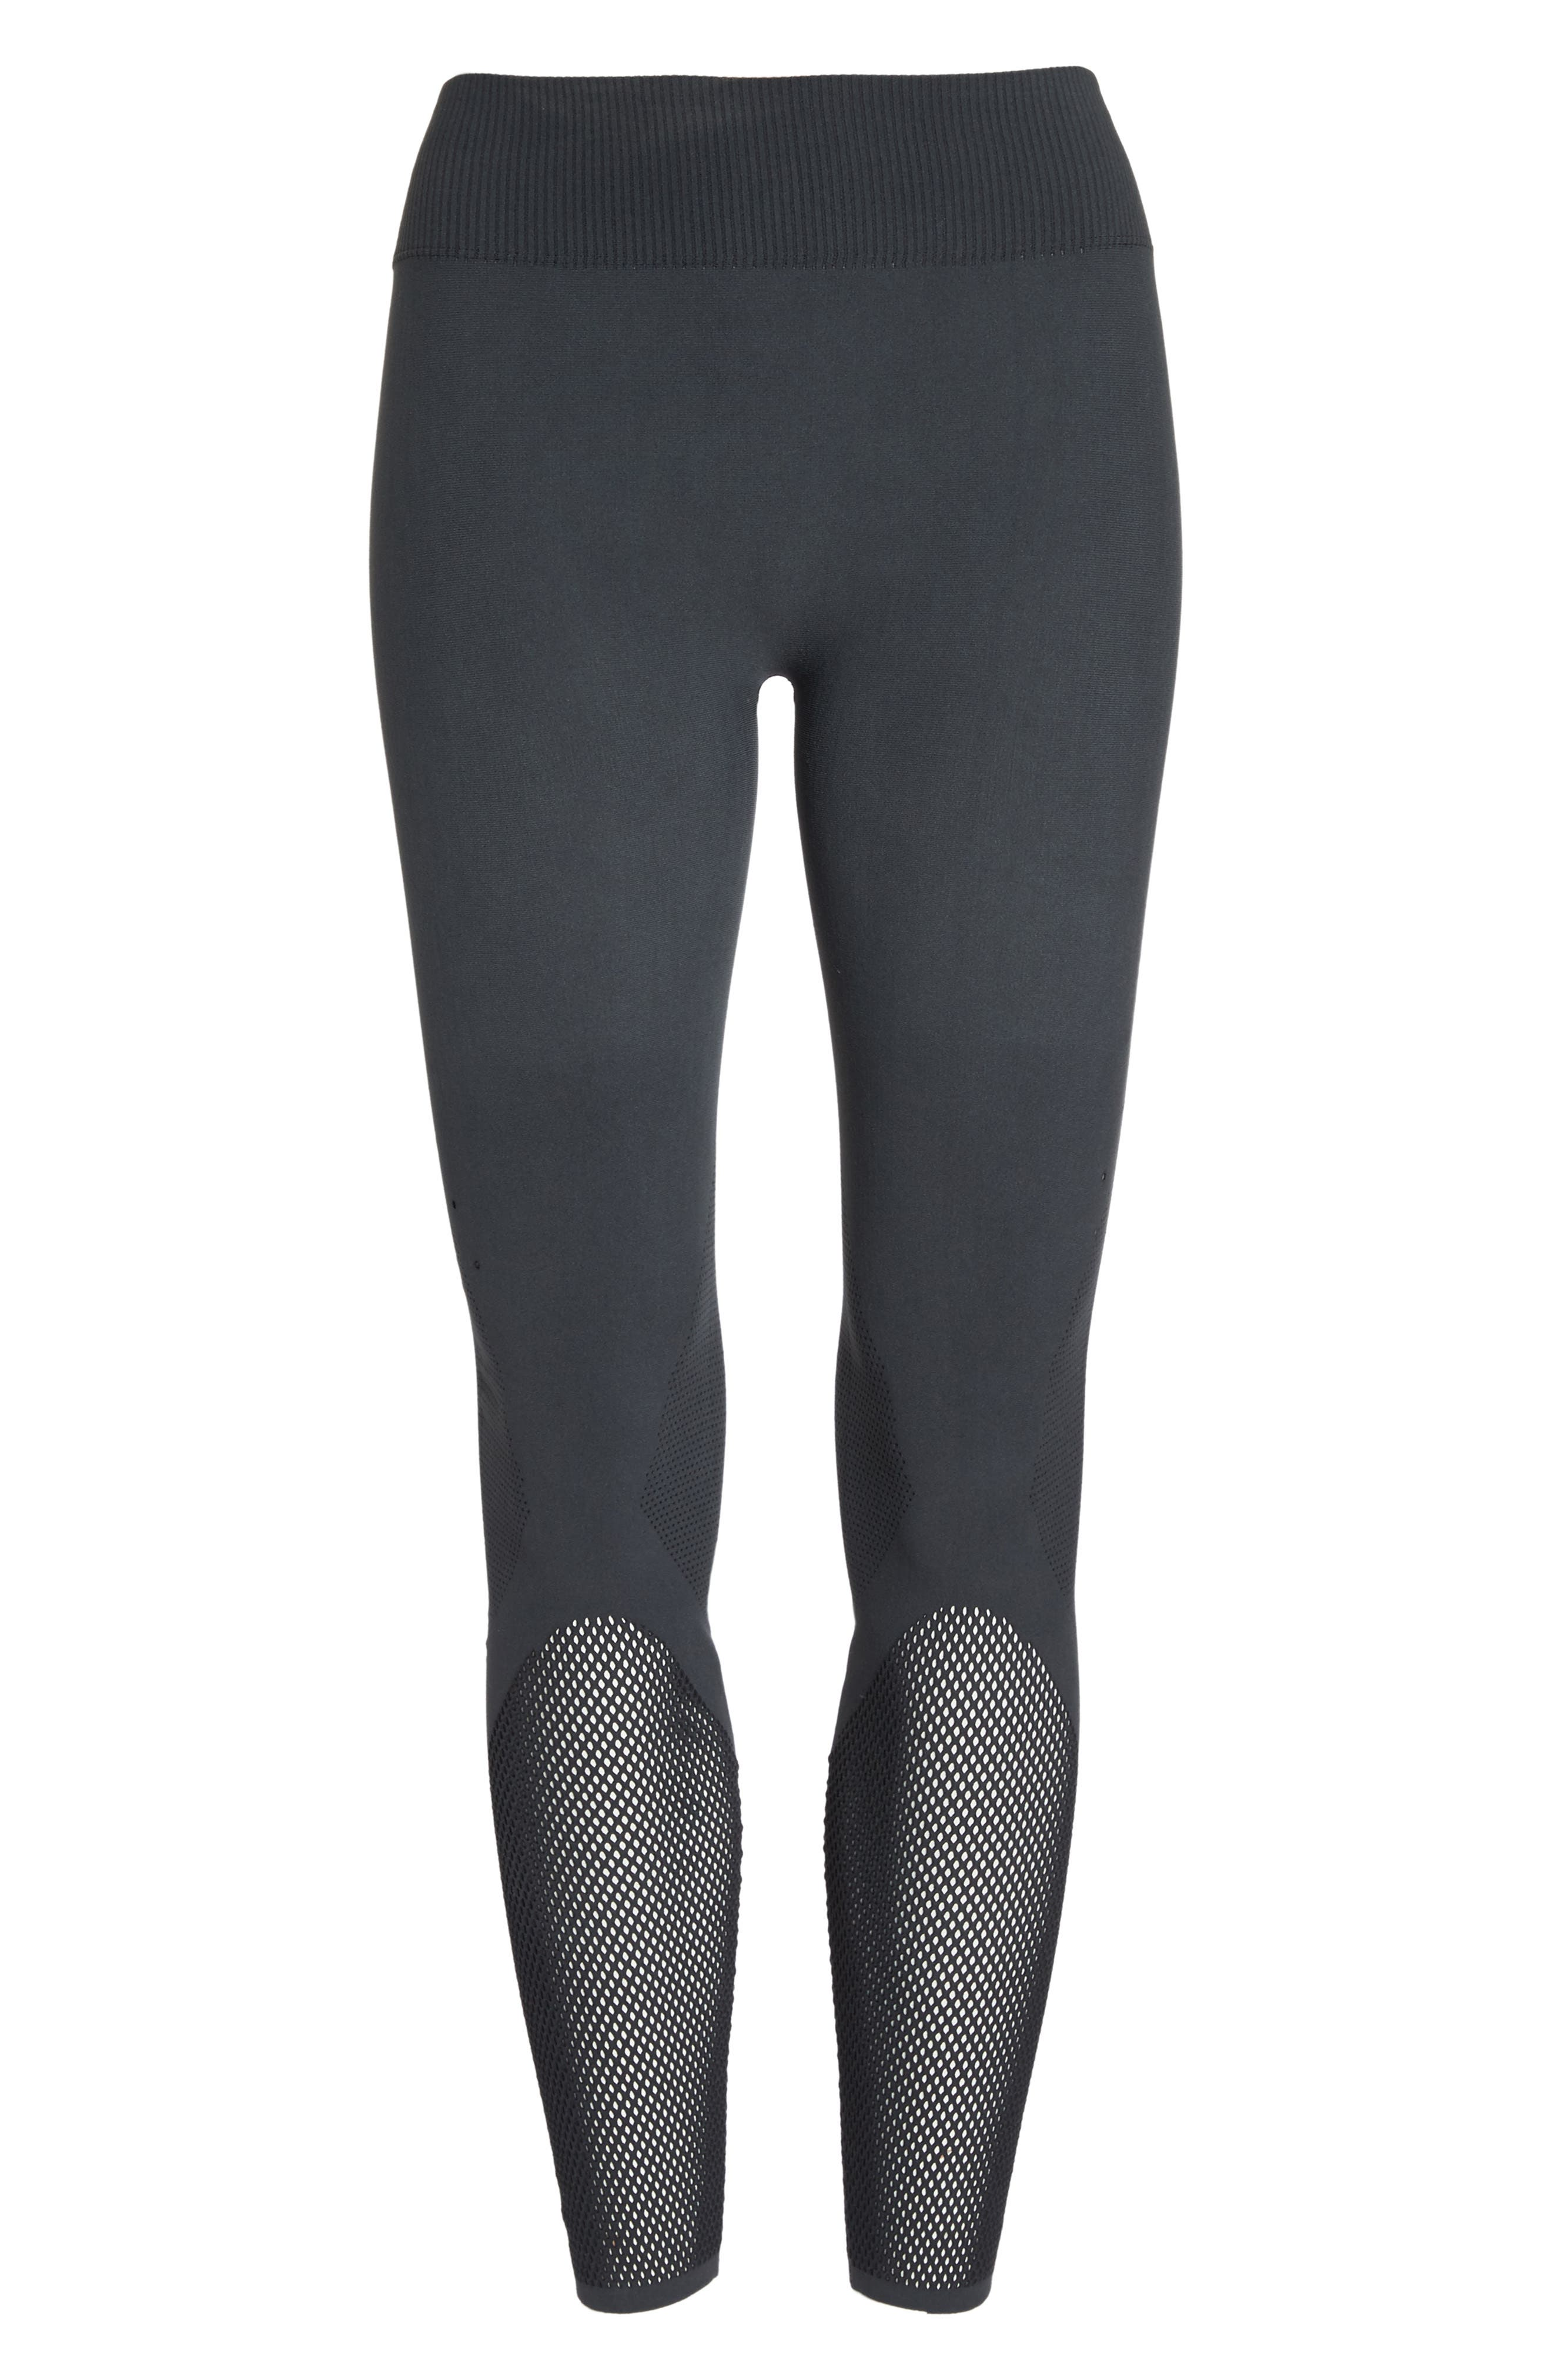 Warp Climacool<sup>®</sup> Knit Tights,                             Alternate thumbnail 6, color,                             Carbon/ Black